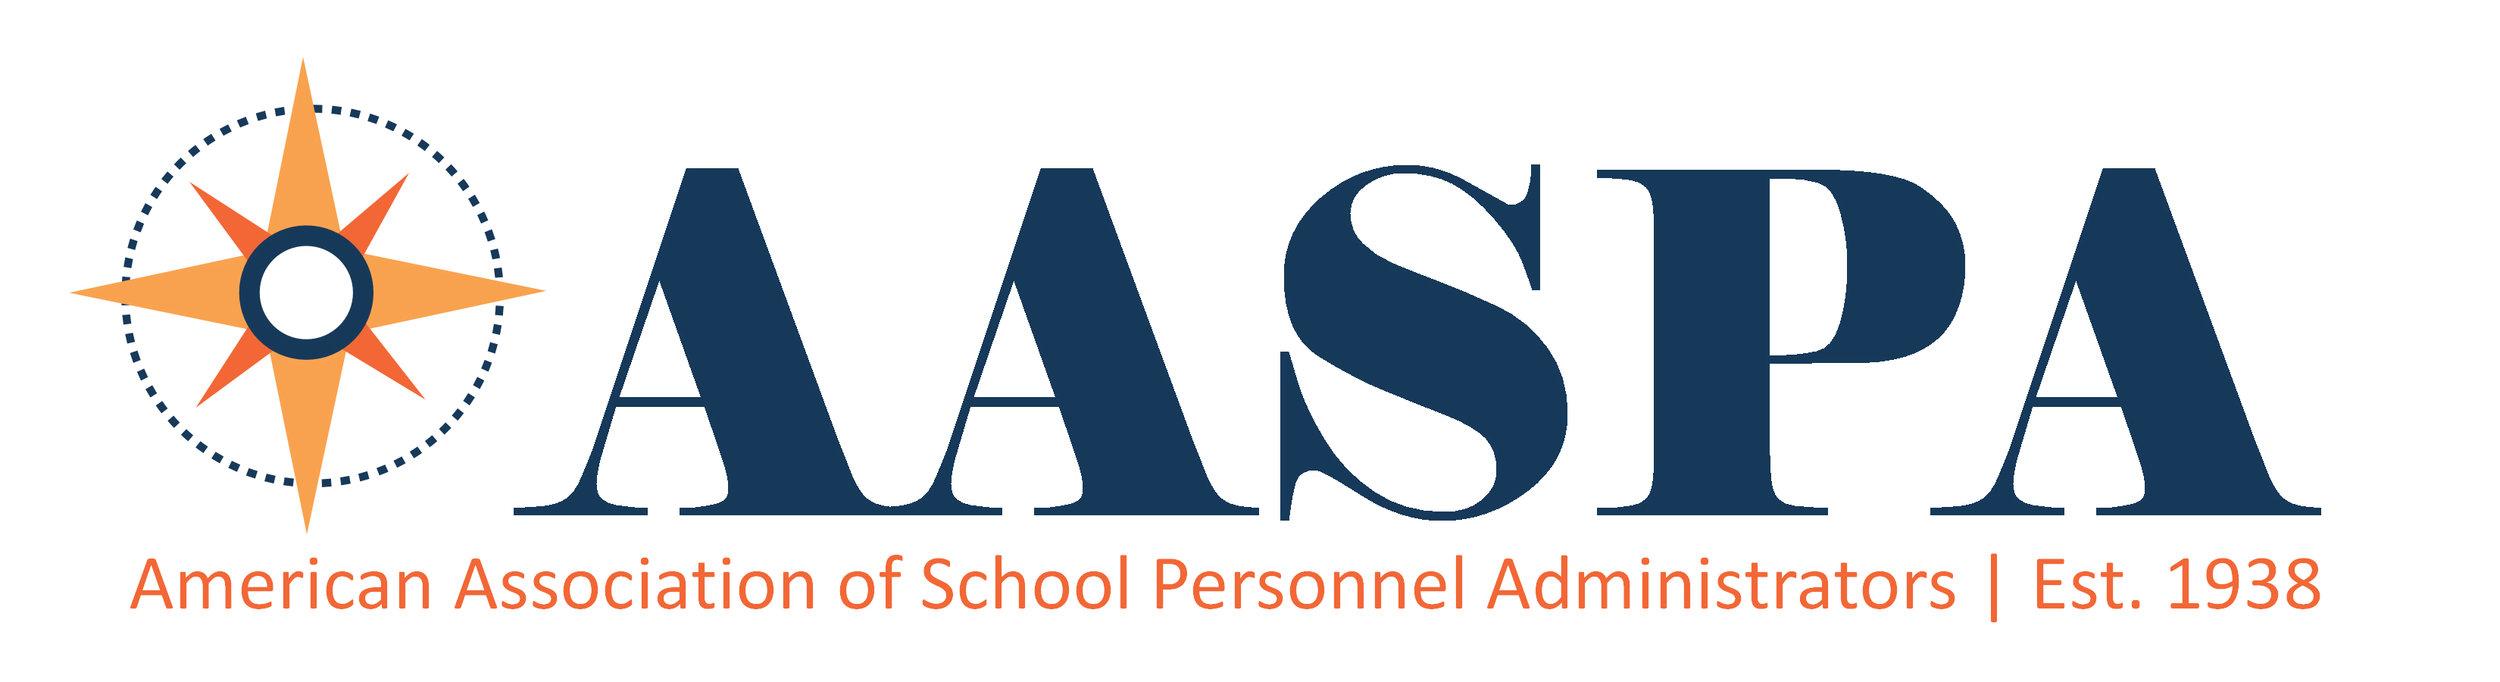 AASPA Logo.jpg